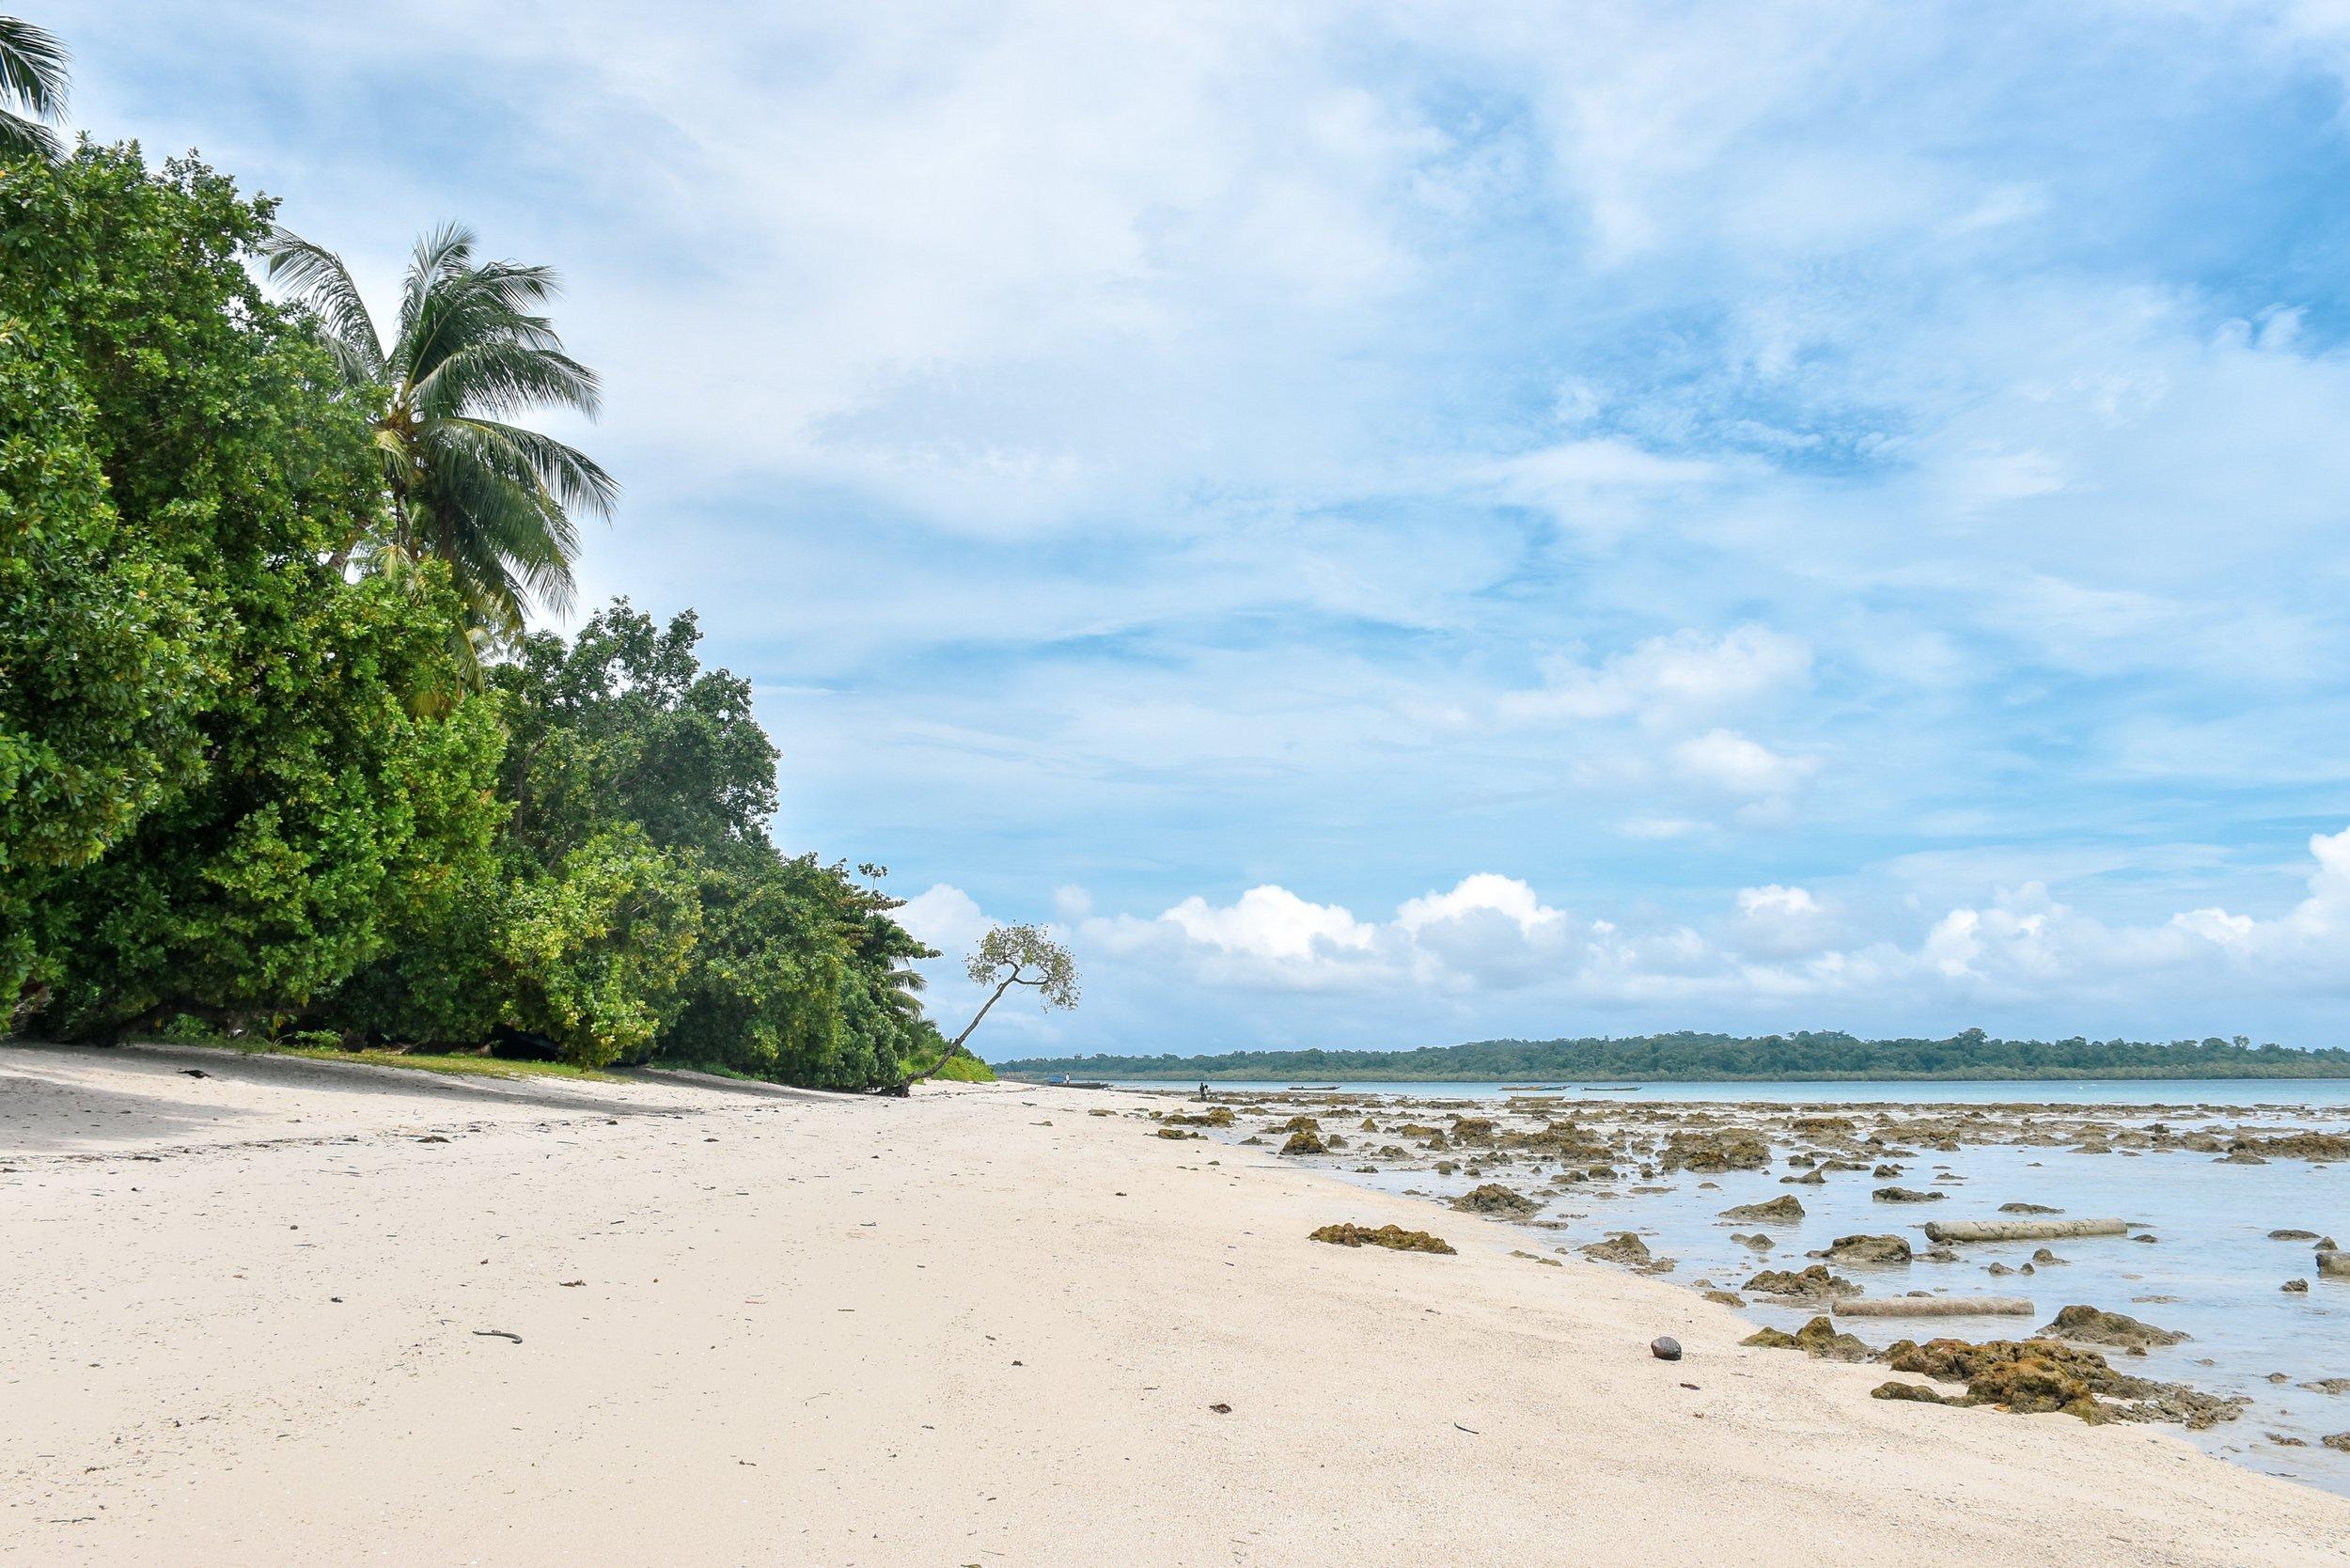 Andaman and Nicobar Islands, India ..  Photo by  Himanshu Jariyal  on  Unsplash